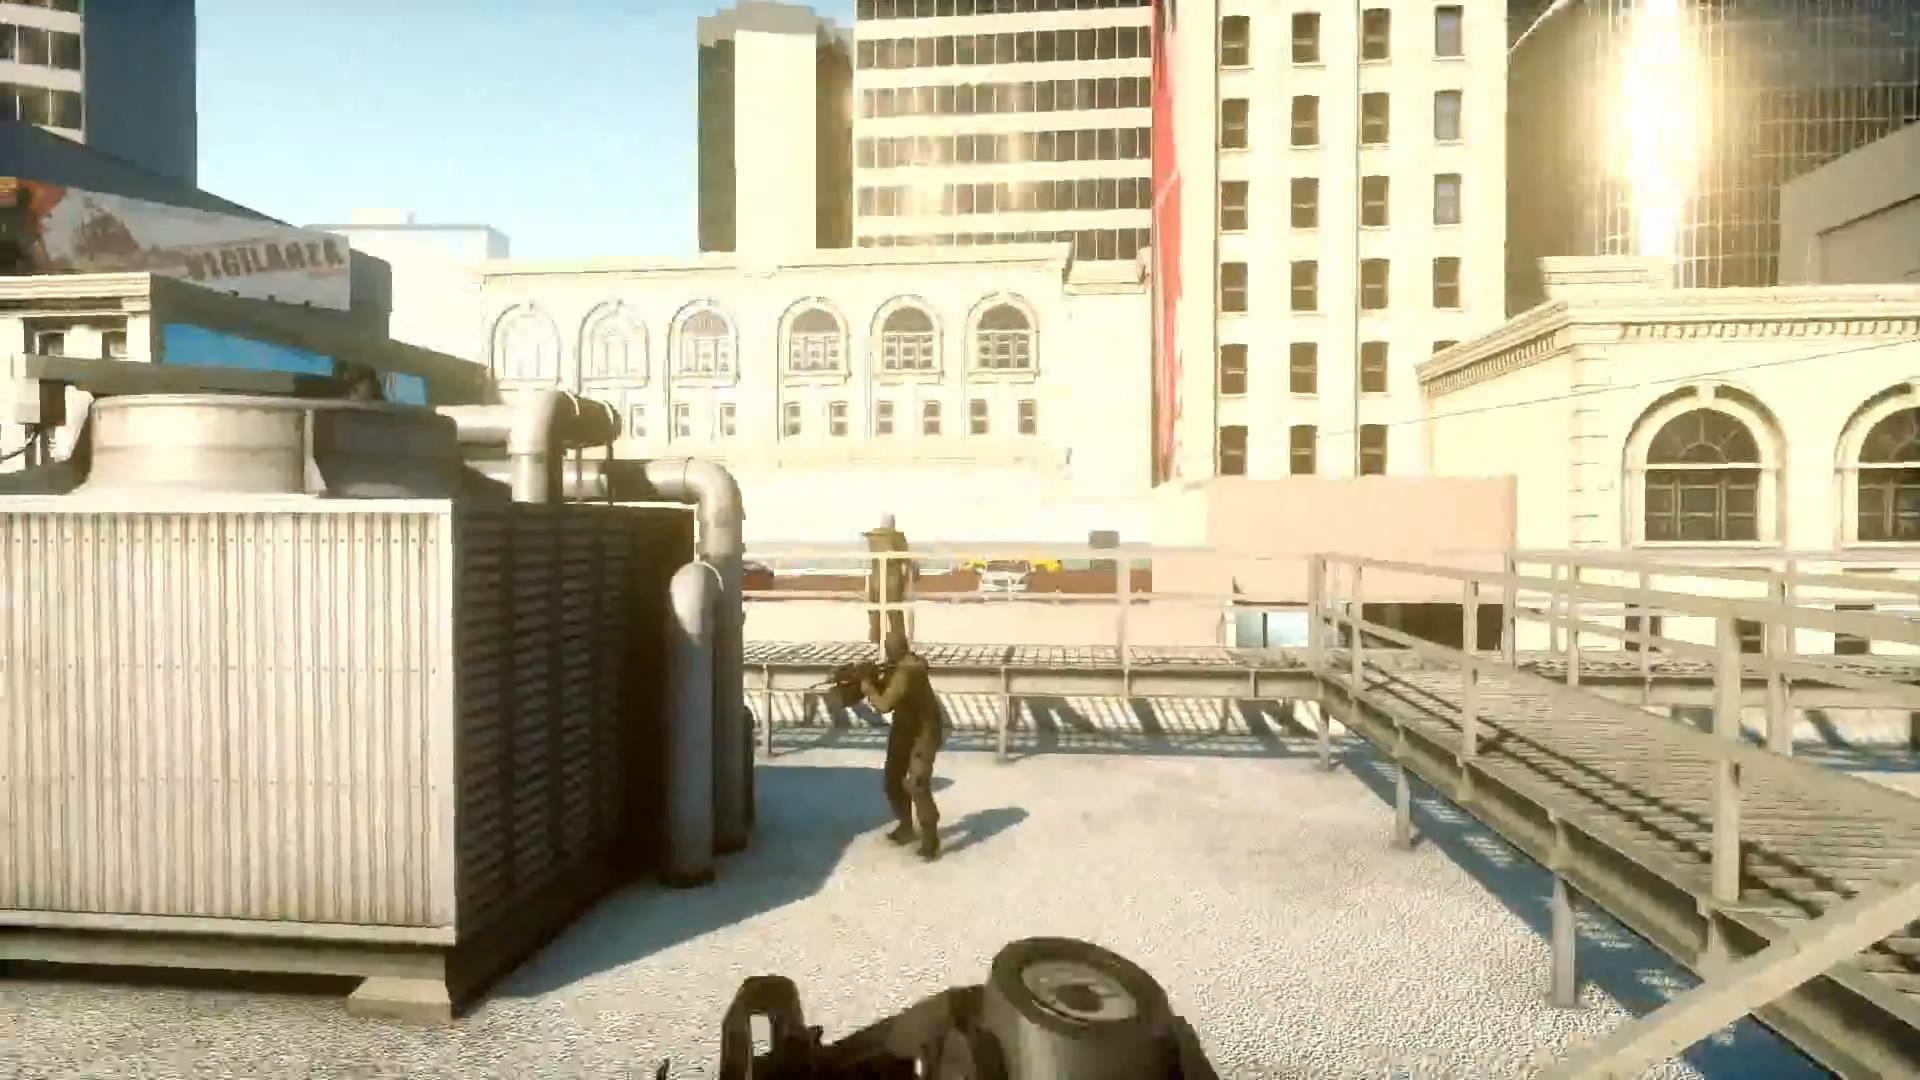 Battlefield-Hardline-Real-Gameplay.mp4_snapshot_01.13_2014.05.28_12.48.08